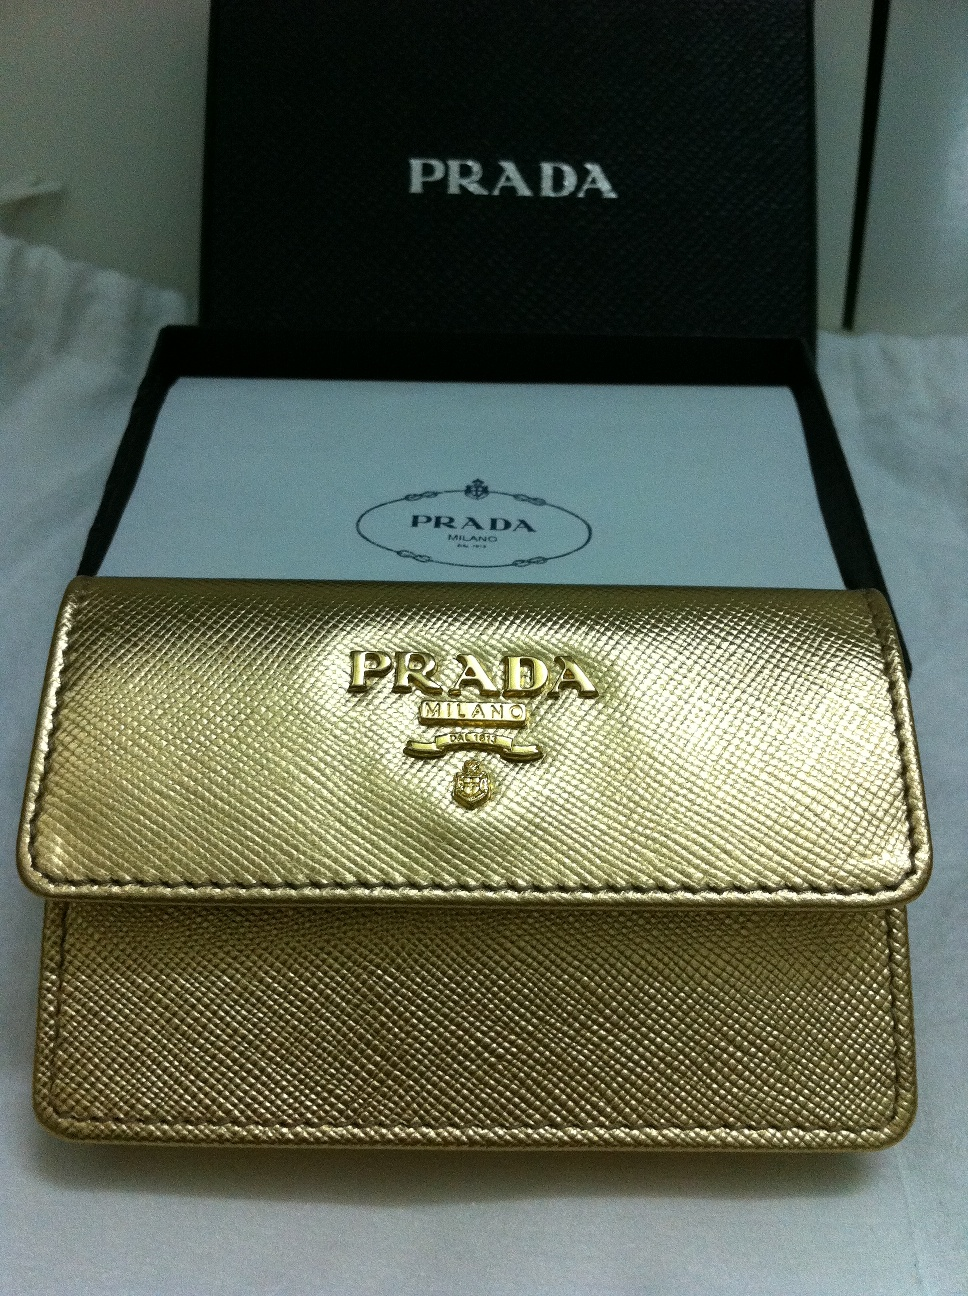 prada leather crossbody bag - Authentic Luxury Items @ Bargain Price: 4 Prada Credit Card Case ...